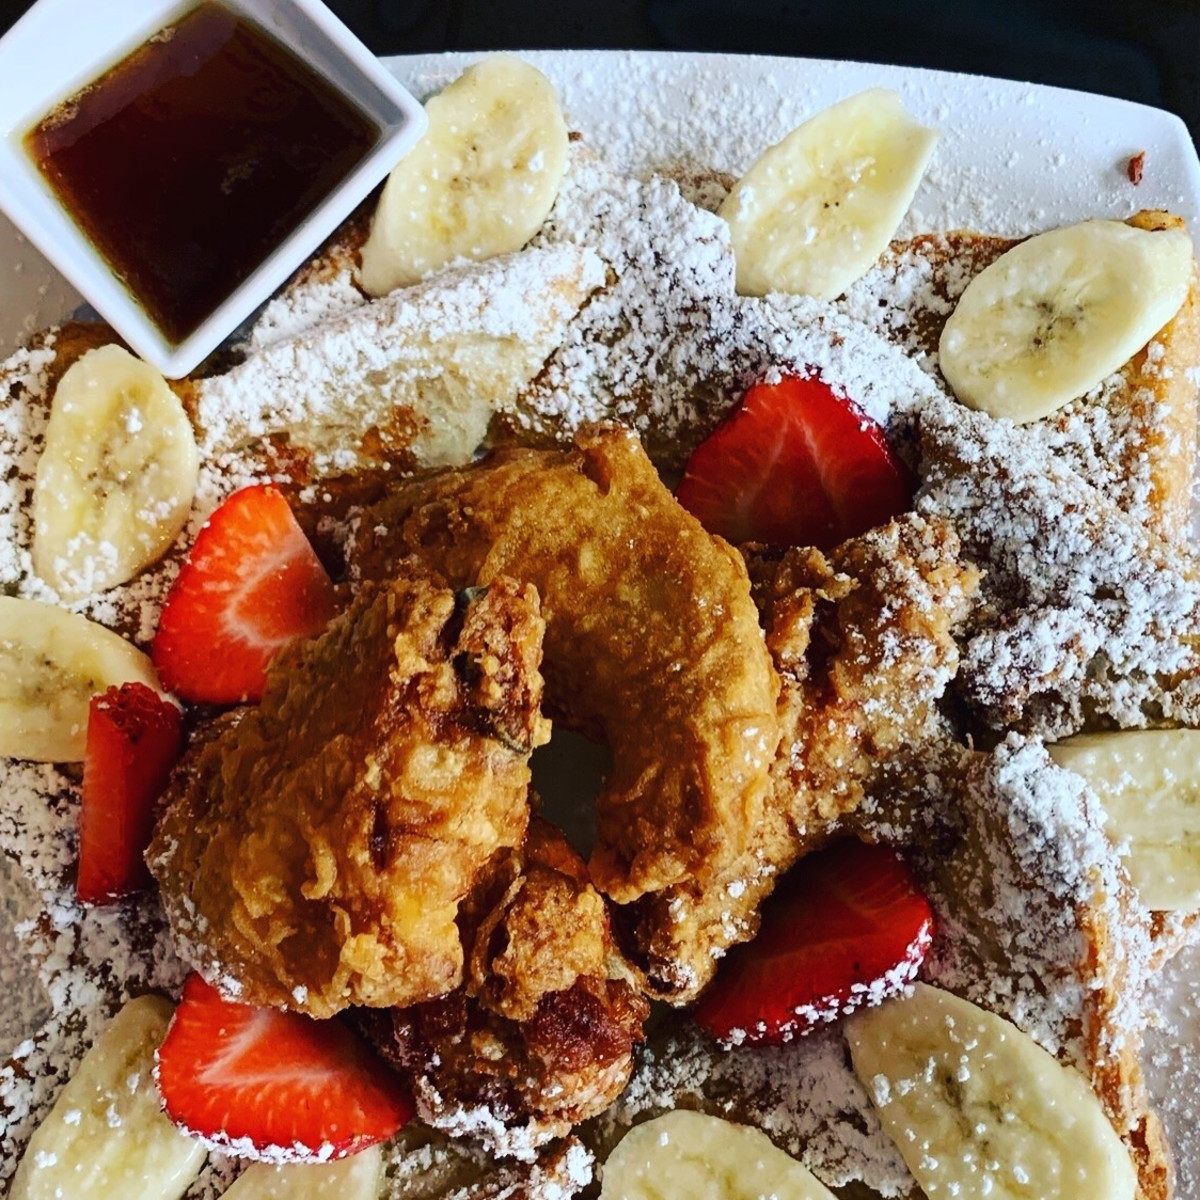 Dak & Bop Korean fried chicken and waffle